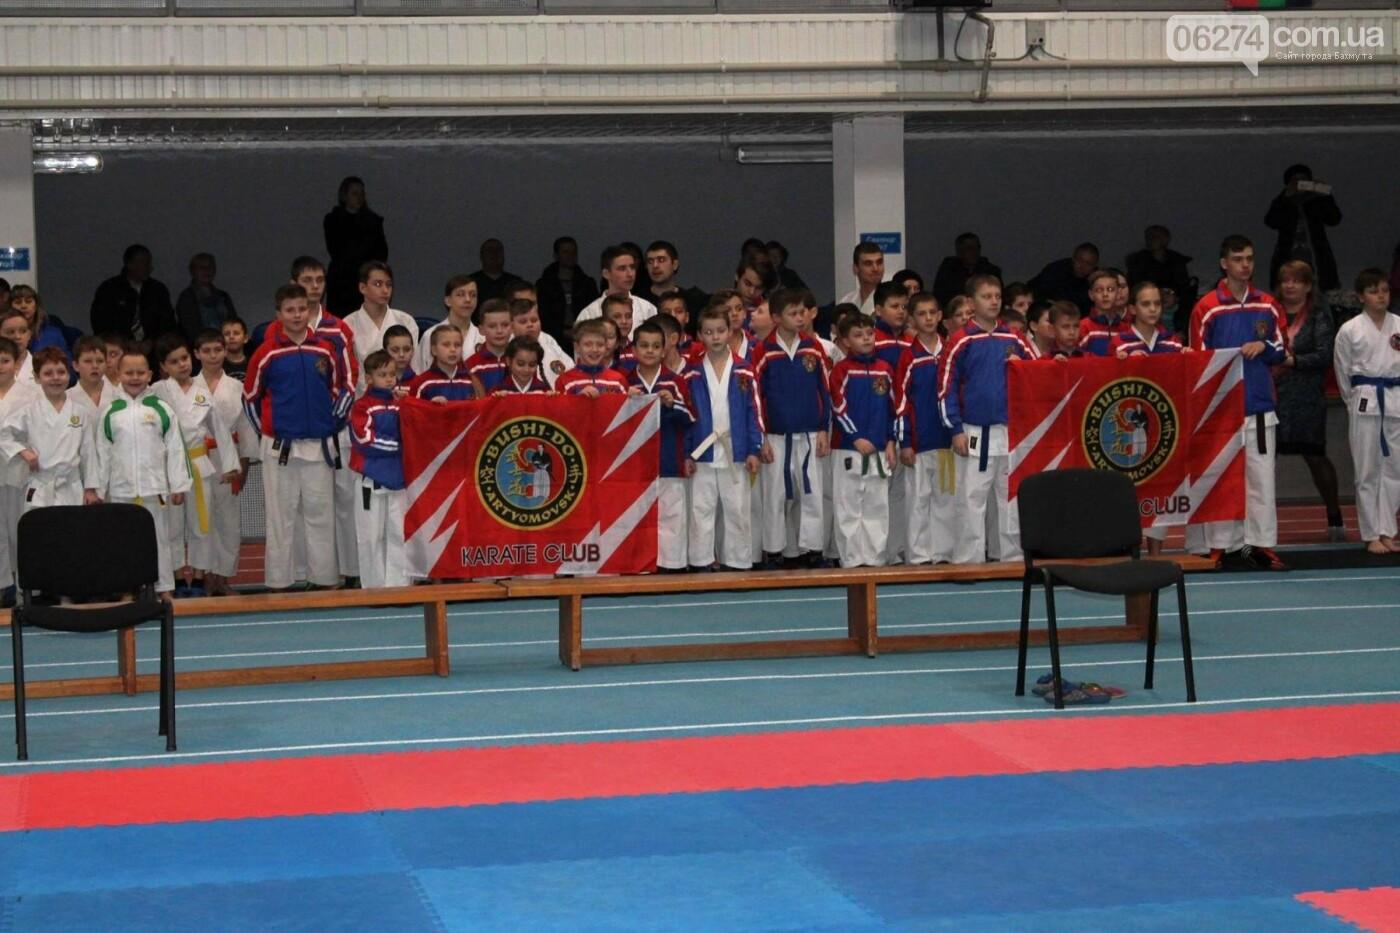 Новогодний турнир по каратэ в Бахмуте, фото-1